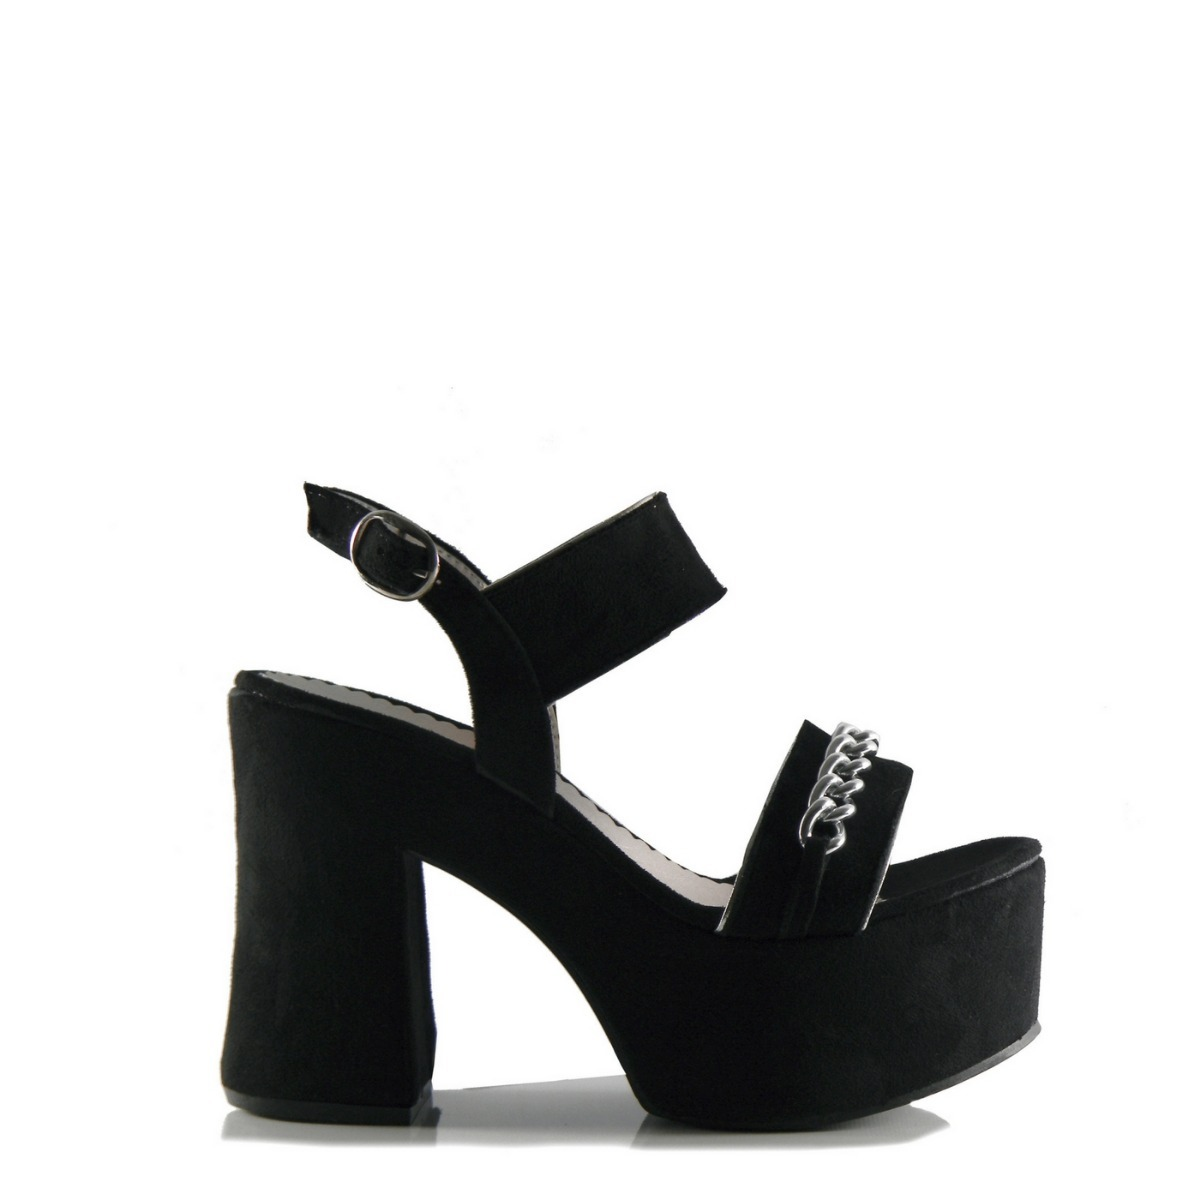 ab3d9c84f87 sandalia zapato mujer gamuza taco palo y cadenita. Cargando zoom.